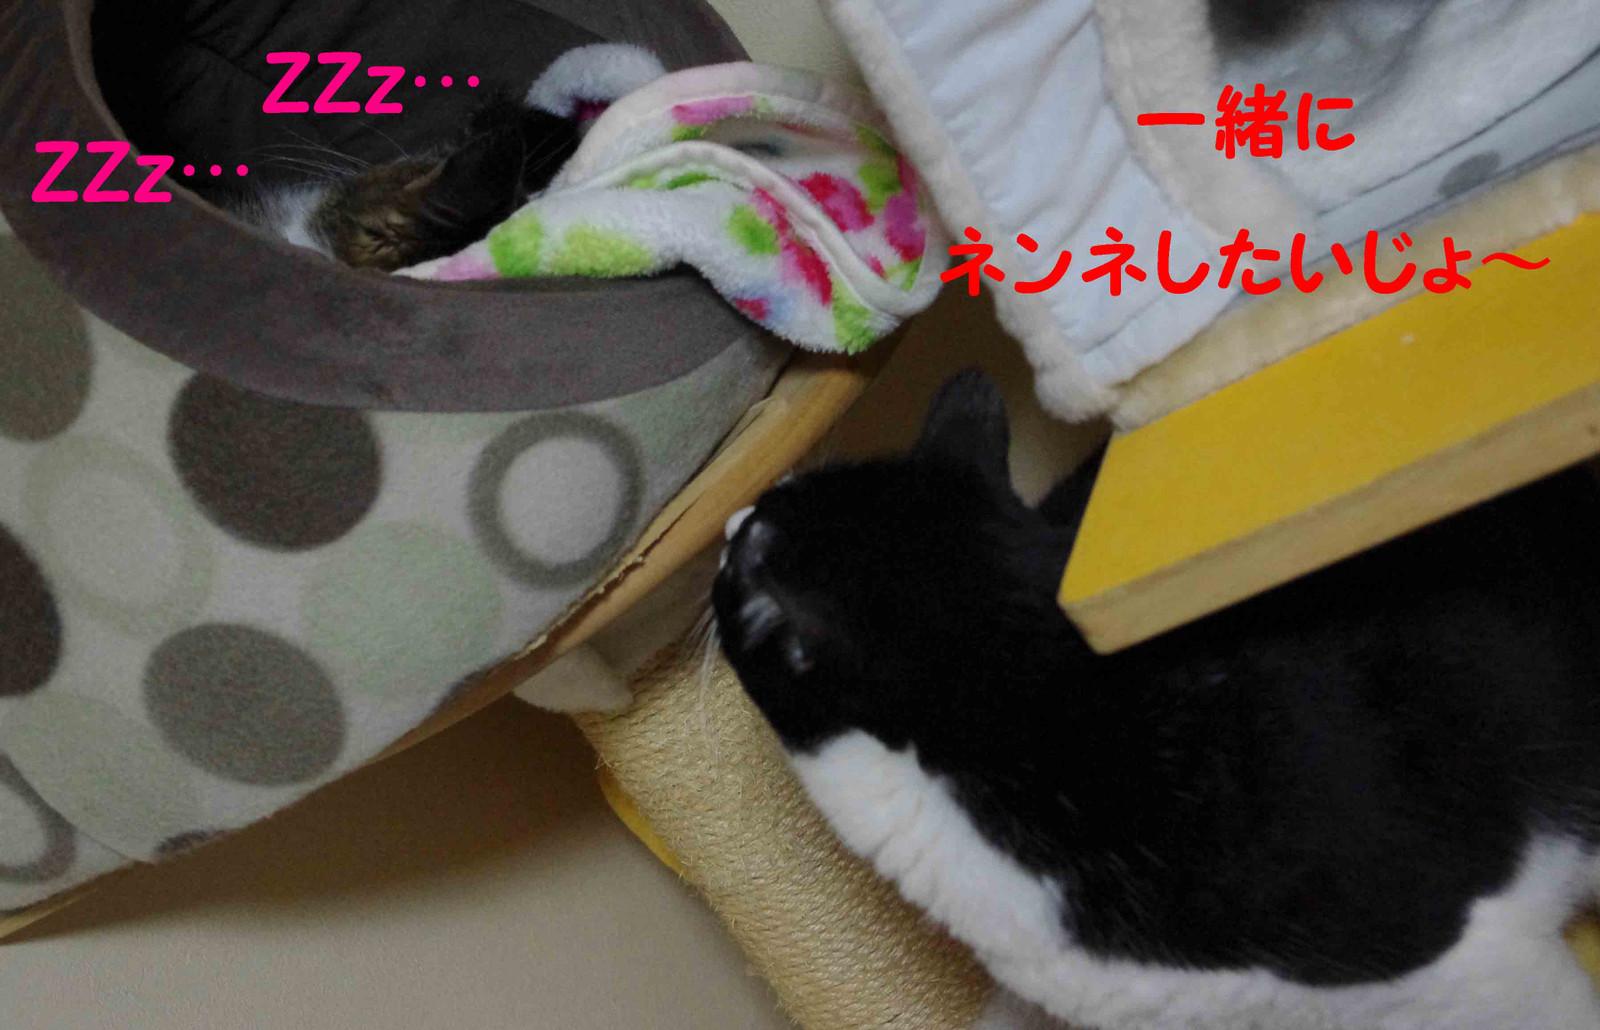 2012_02_11_2144_edited1_2